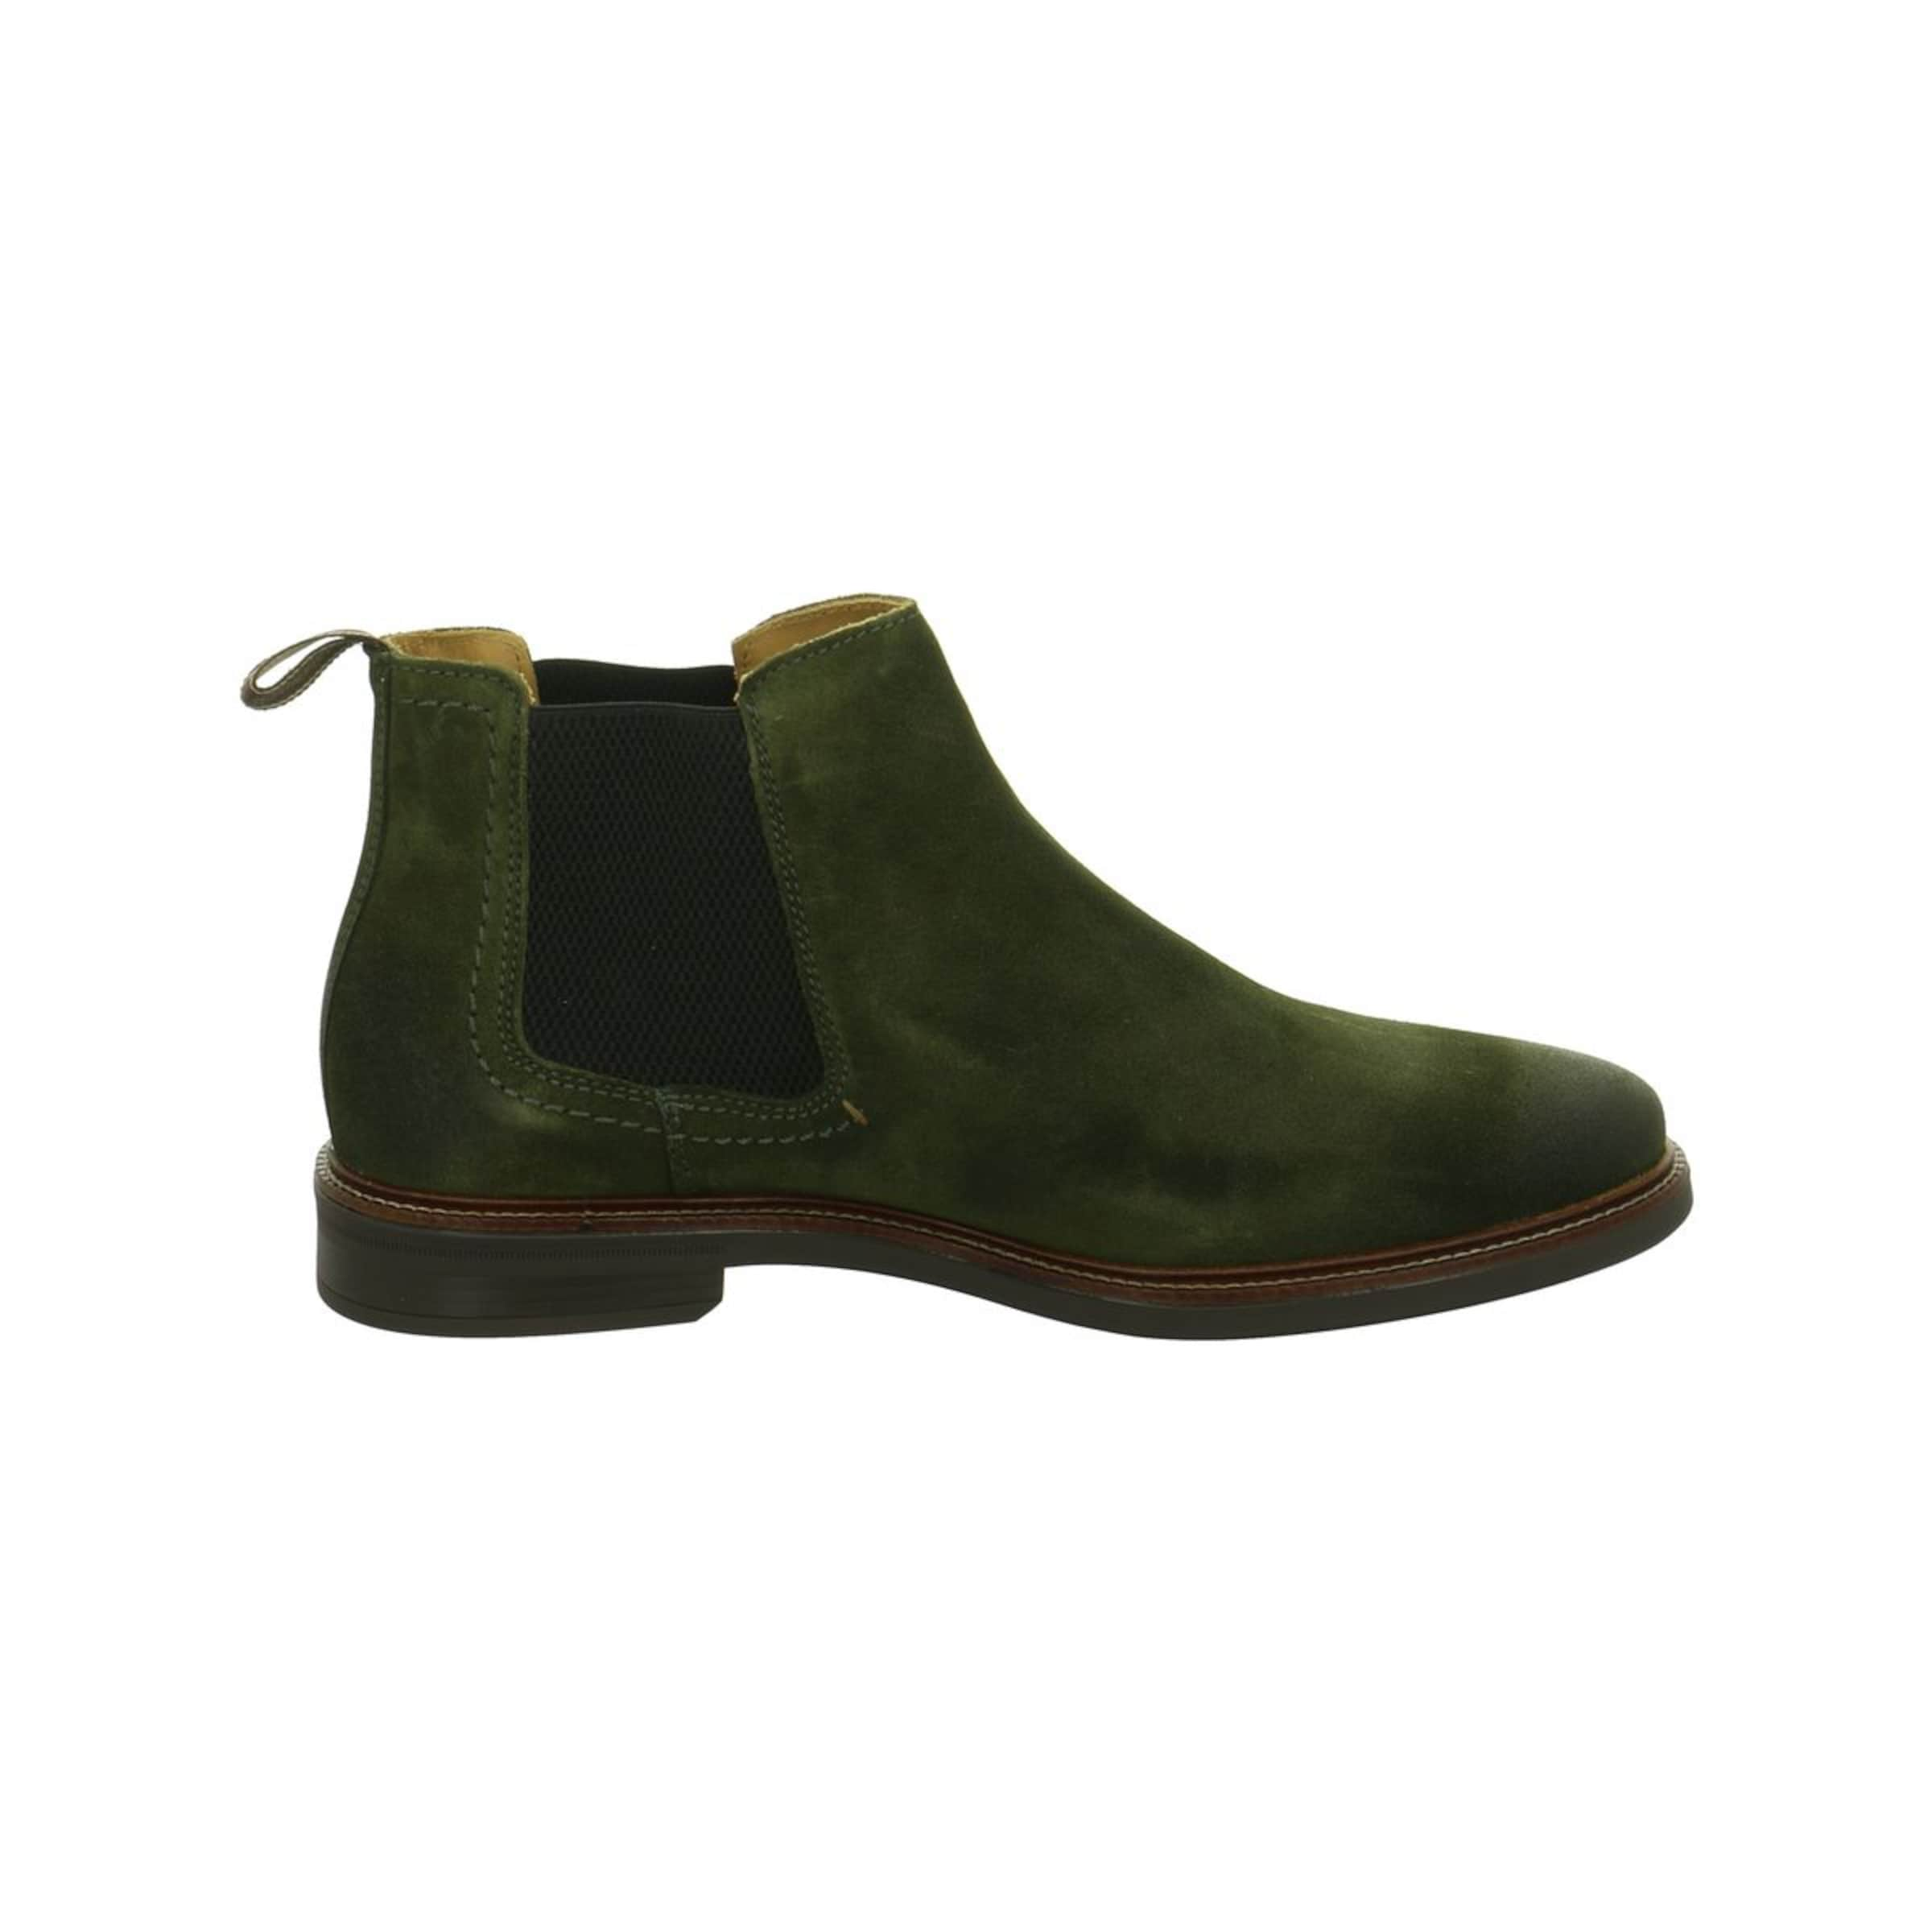 Schwarz Lurchi Boots In BraunOliv Sarato Chelsea uOkZiTPX